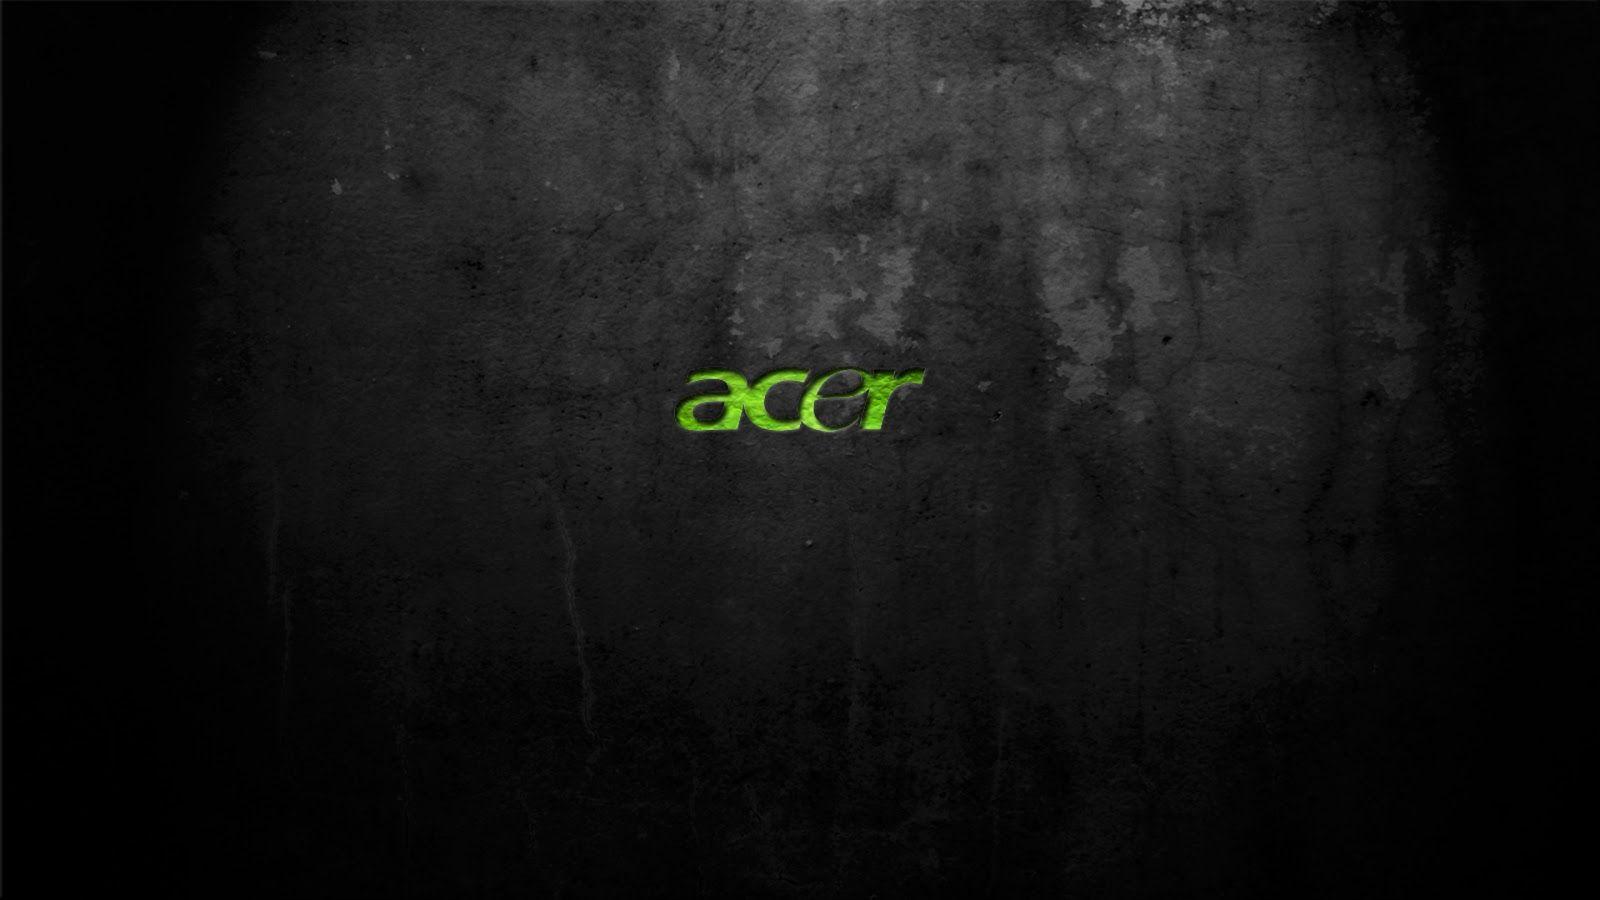 Acer Predator Multi Color Wallpapers Alon Imgur X Acer Logo Wallpapers  Wallpapers Adorable Wallpapers